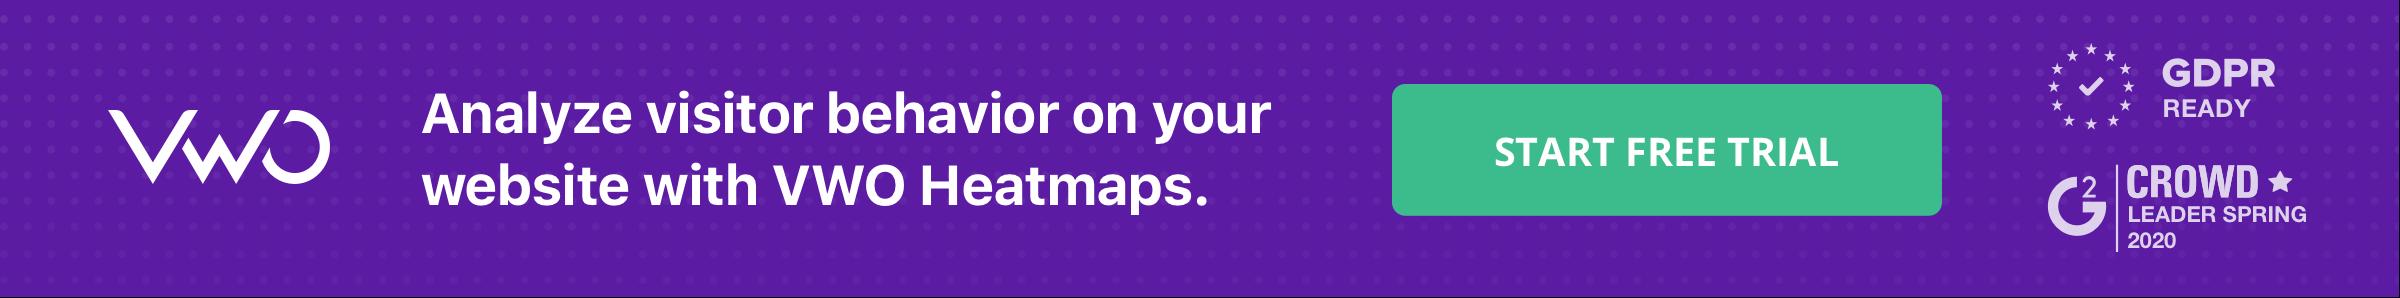 Blog Banner VWO Heatmaps